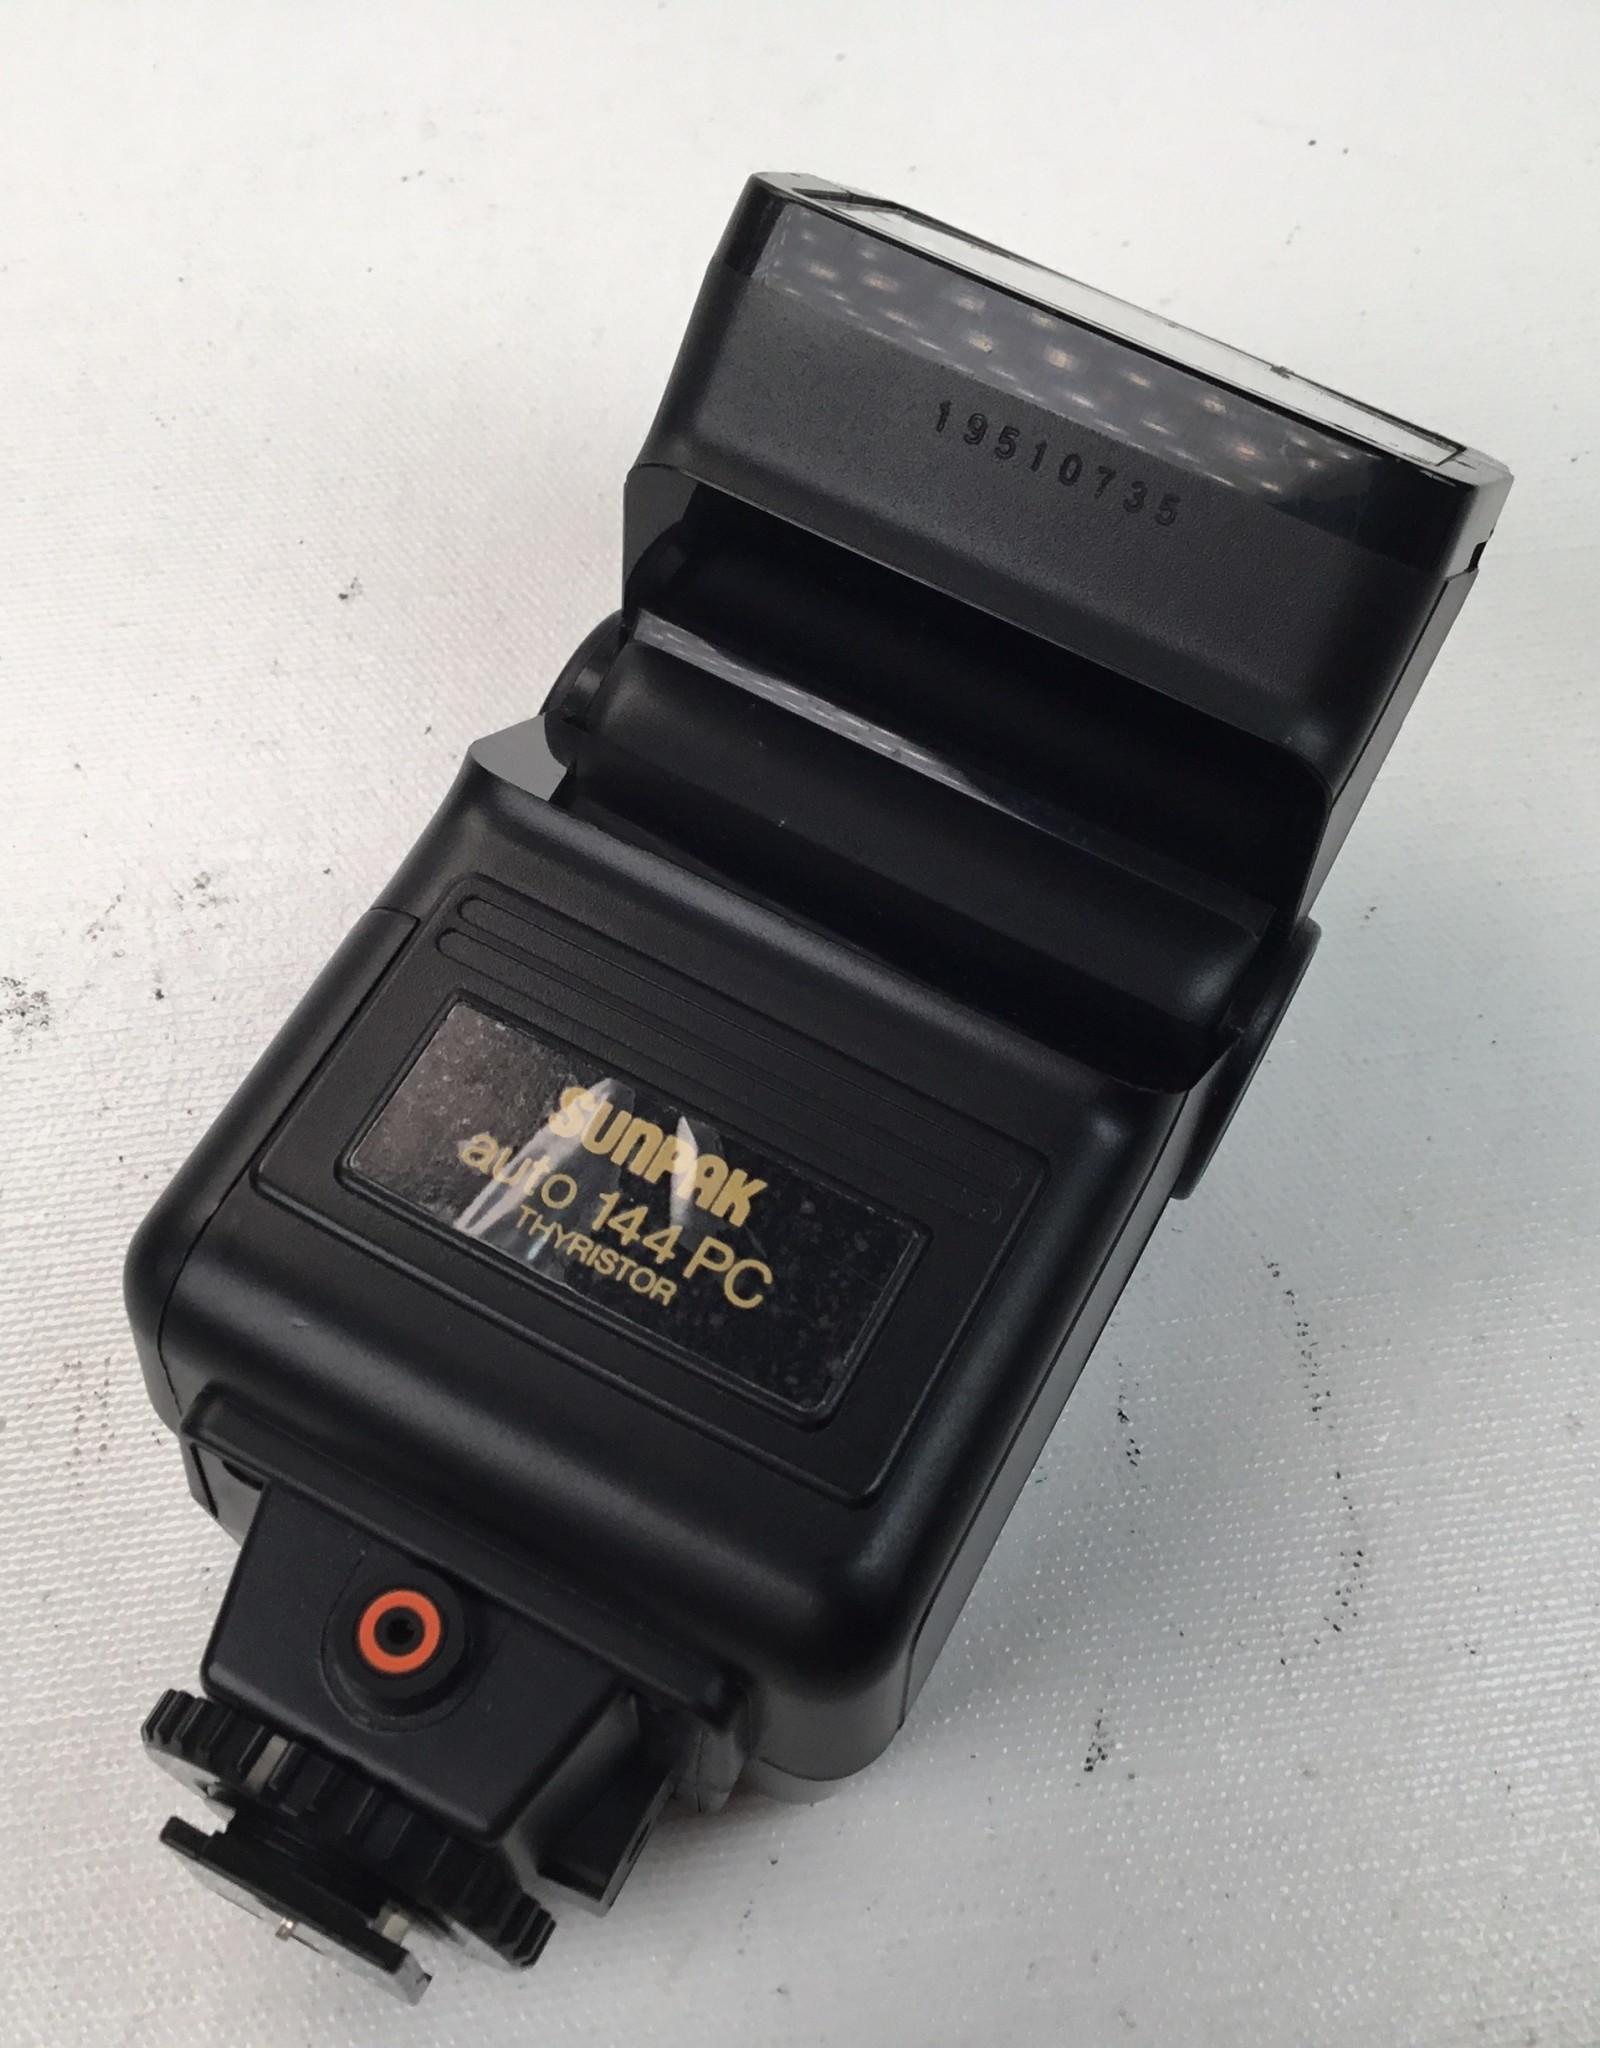 Sunpak auto 144 PC Flash Used EX